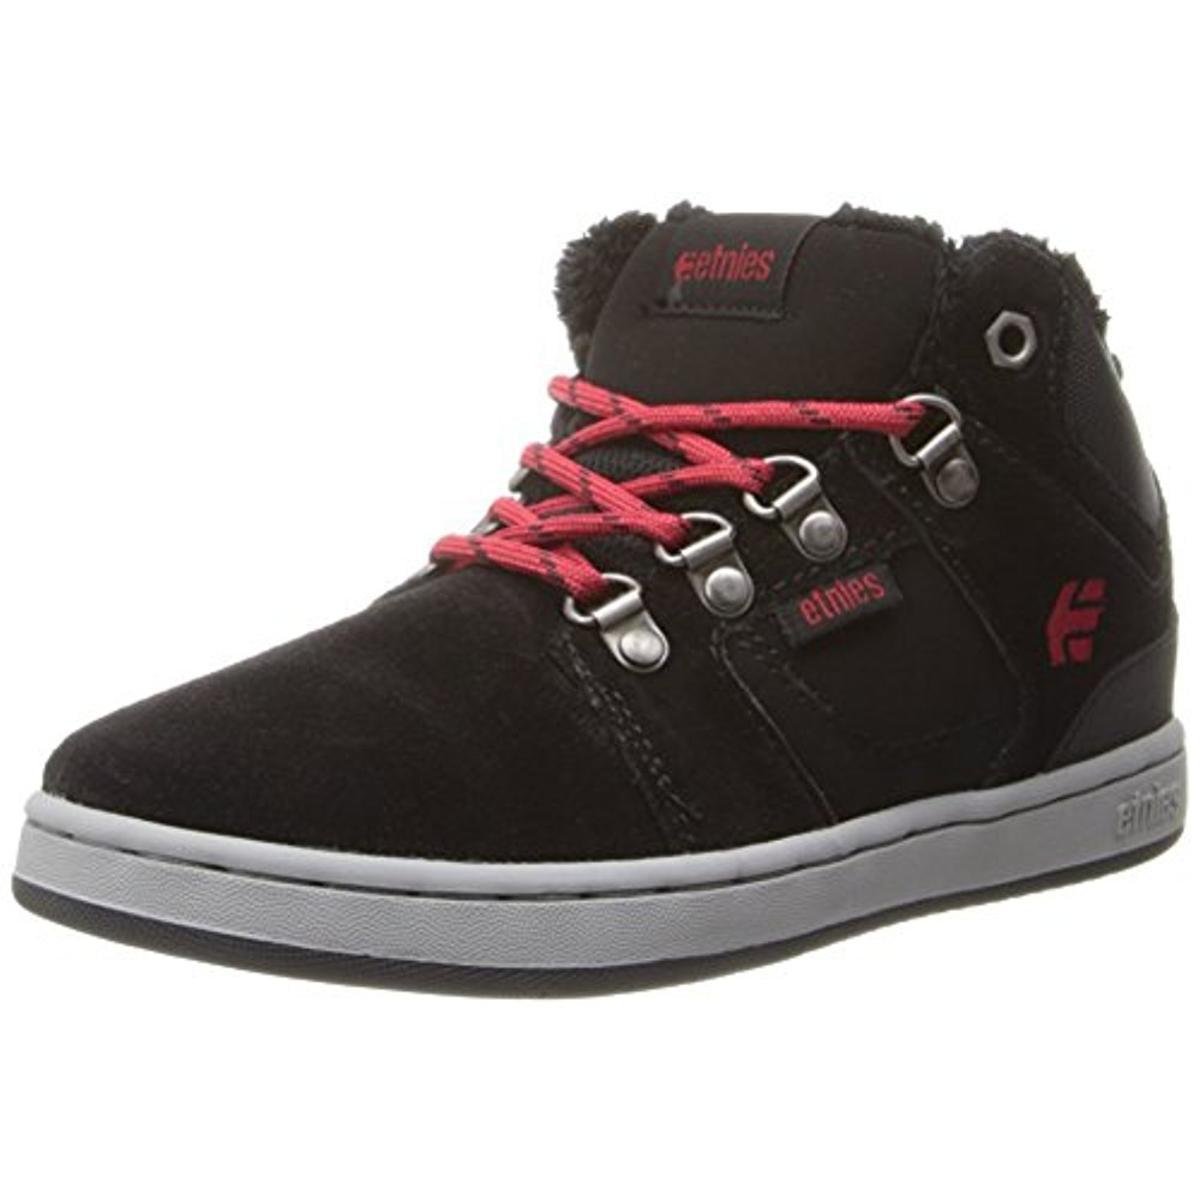 Skate shoes walmart - By Etnies